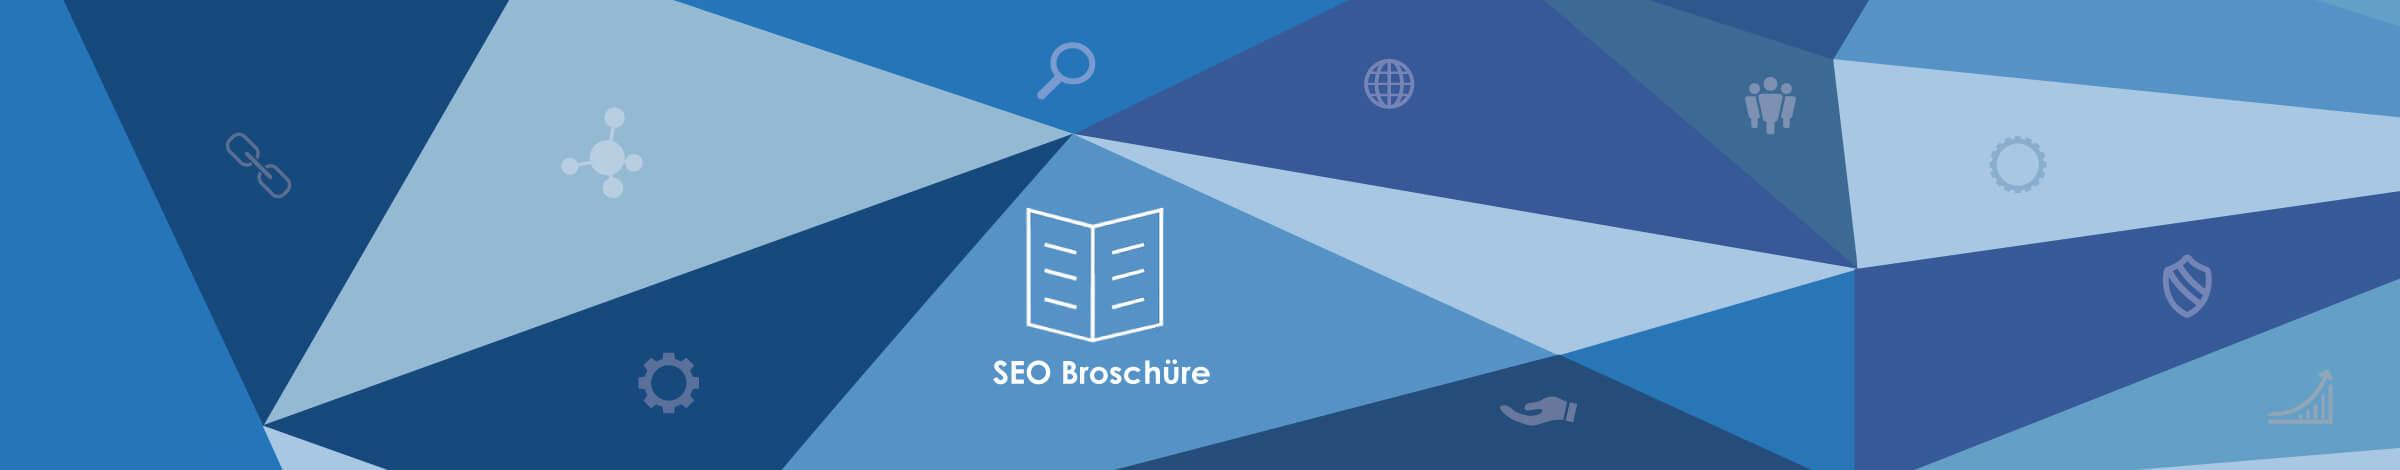 web_updates_kmu_wuk-ch_SEO-Broschuere